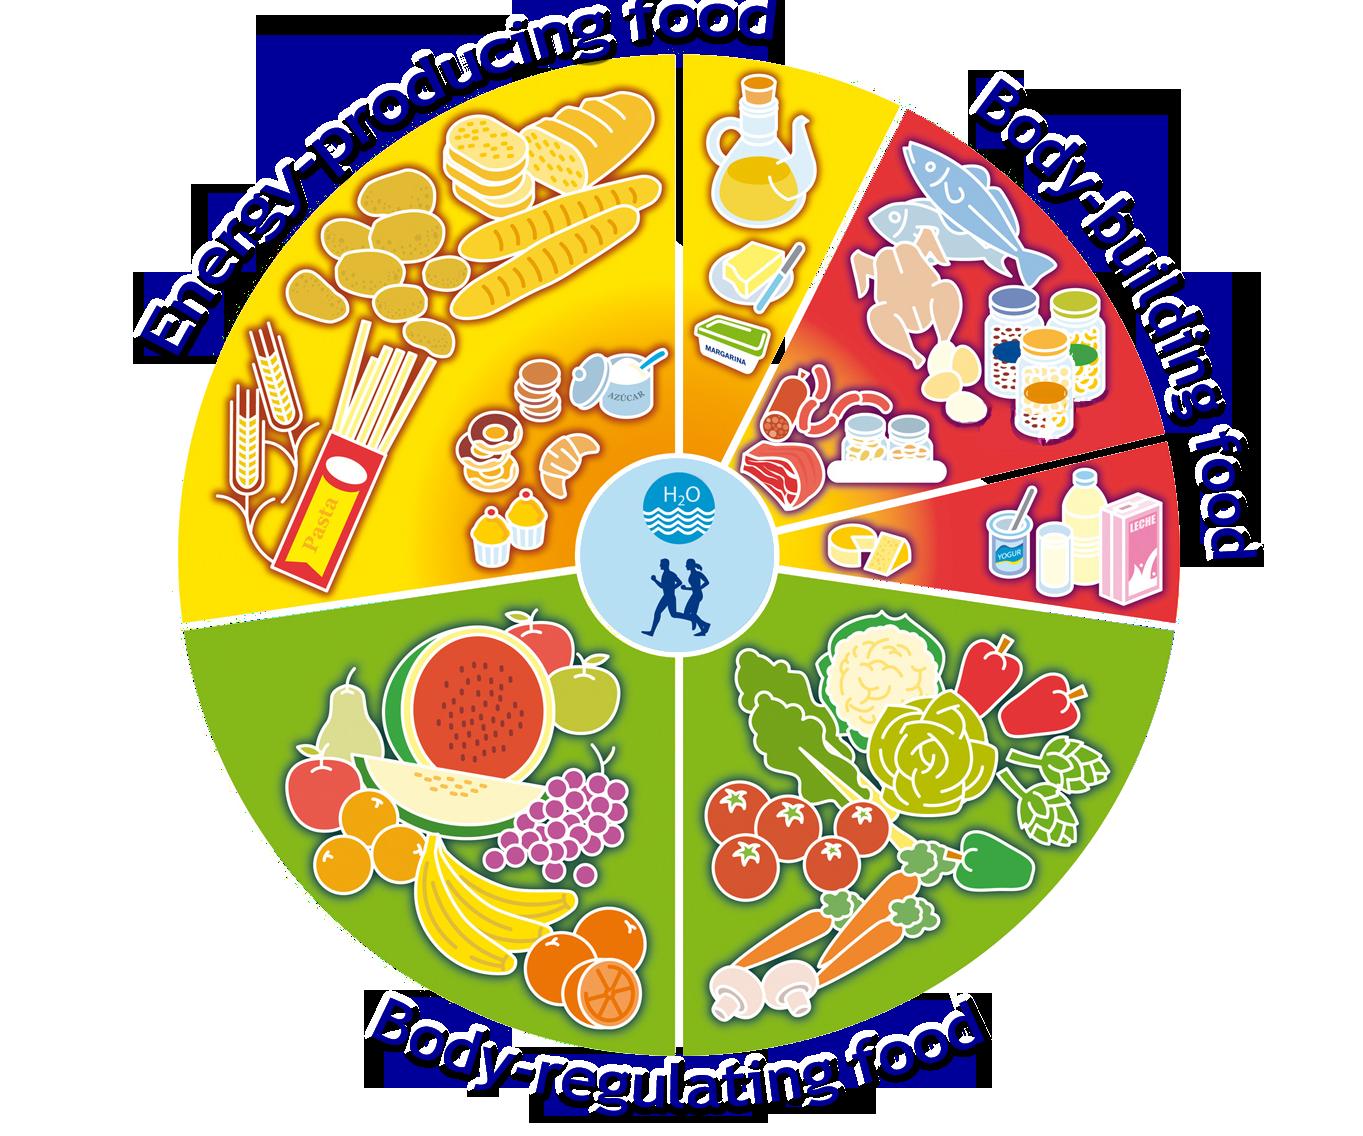 Food Wheel Energy Producting Food Body Building Food Body Regulating Food Food Pyramid Meals On Wheels Food